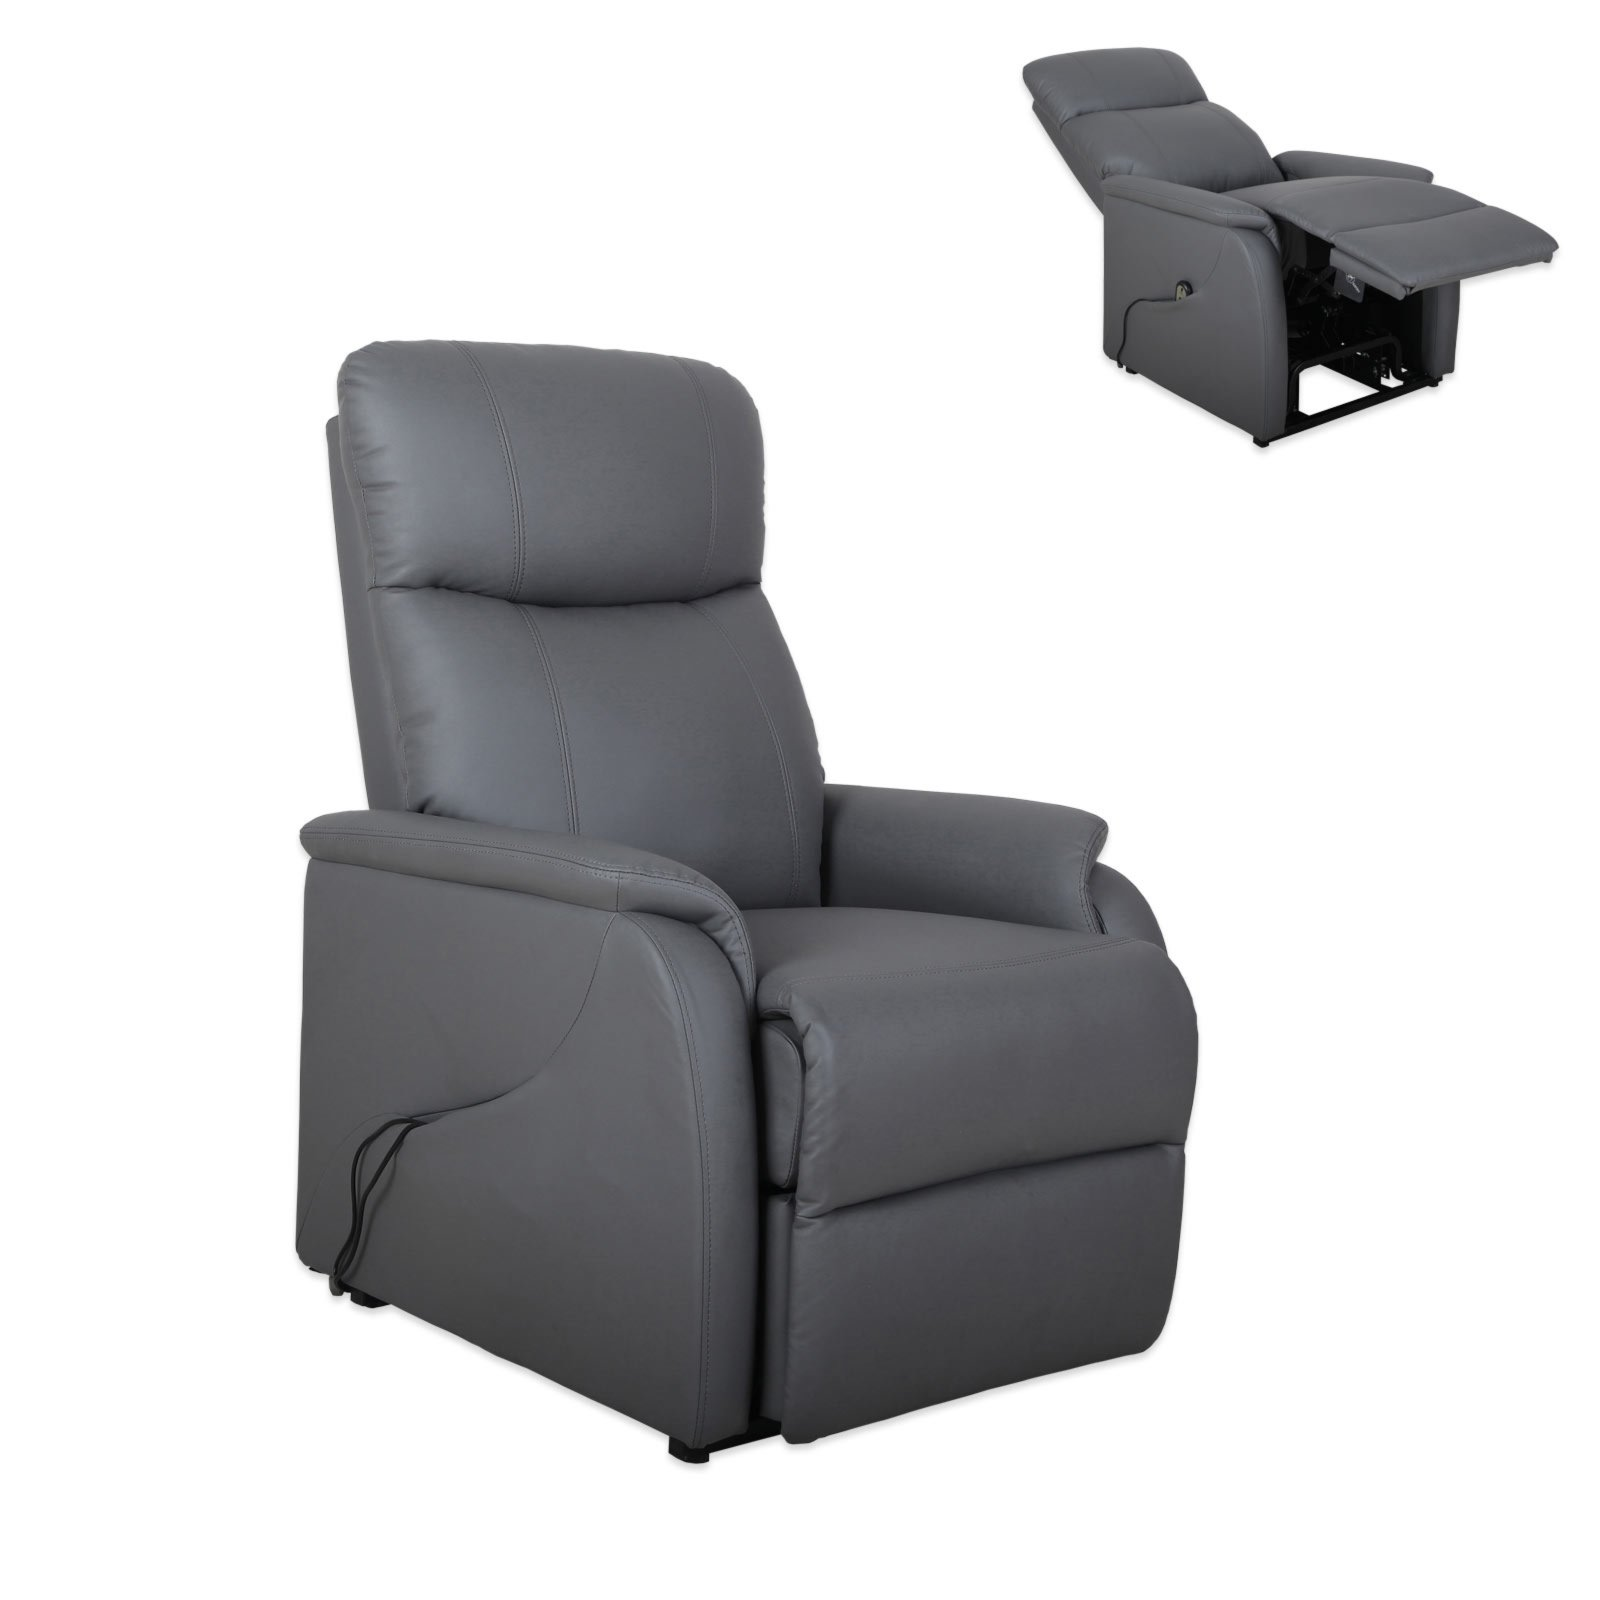 relaxsessel grau kunstleder elektronische aufstehhilfe fernseh relaxsessel sessel. Black Bedroom Furniture Sets. Home Design Ideas